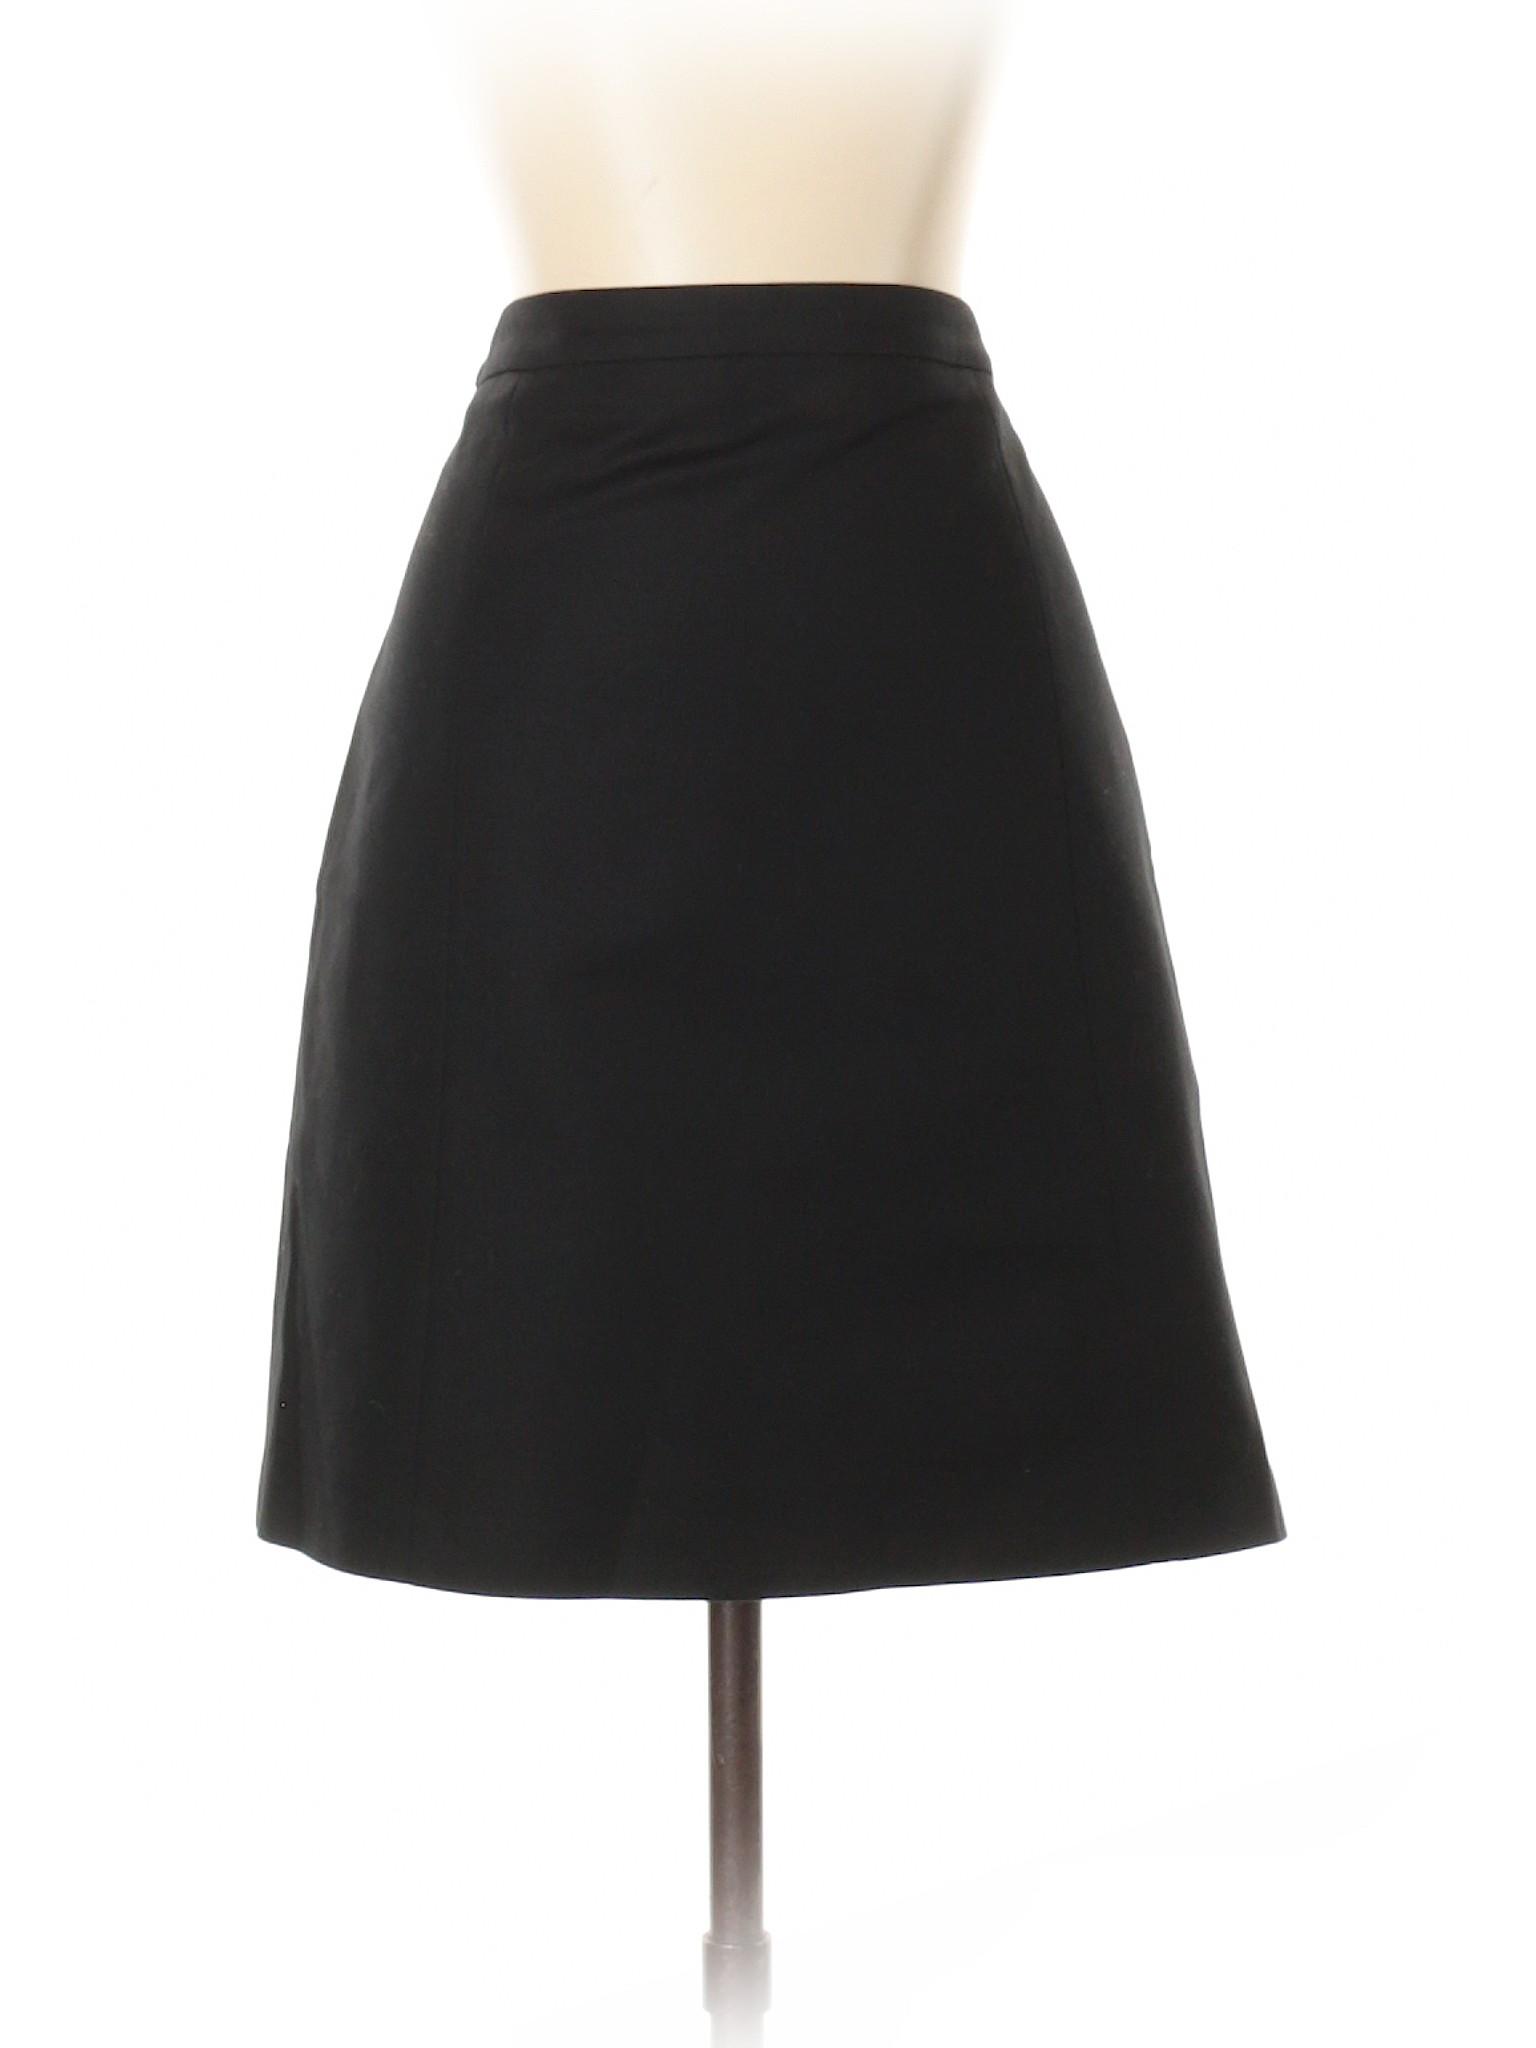 Elie Tahari winter Leisure Skirt Casual CHSx54